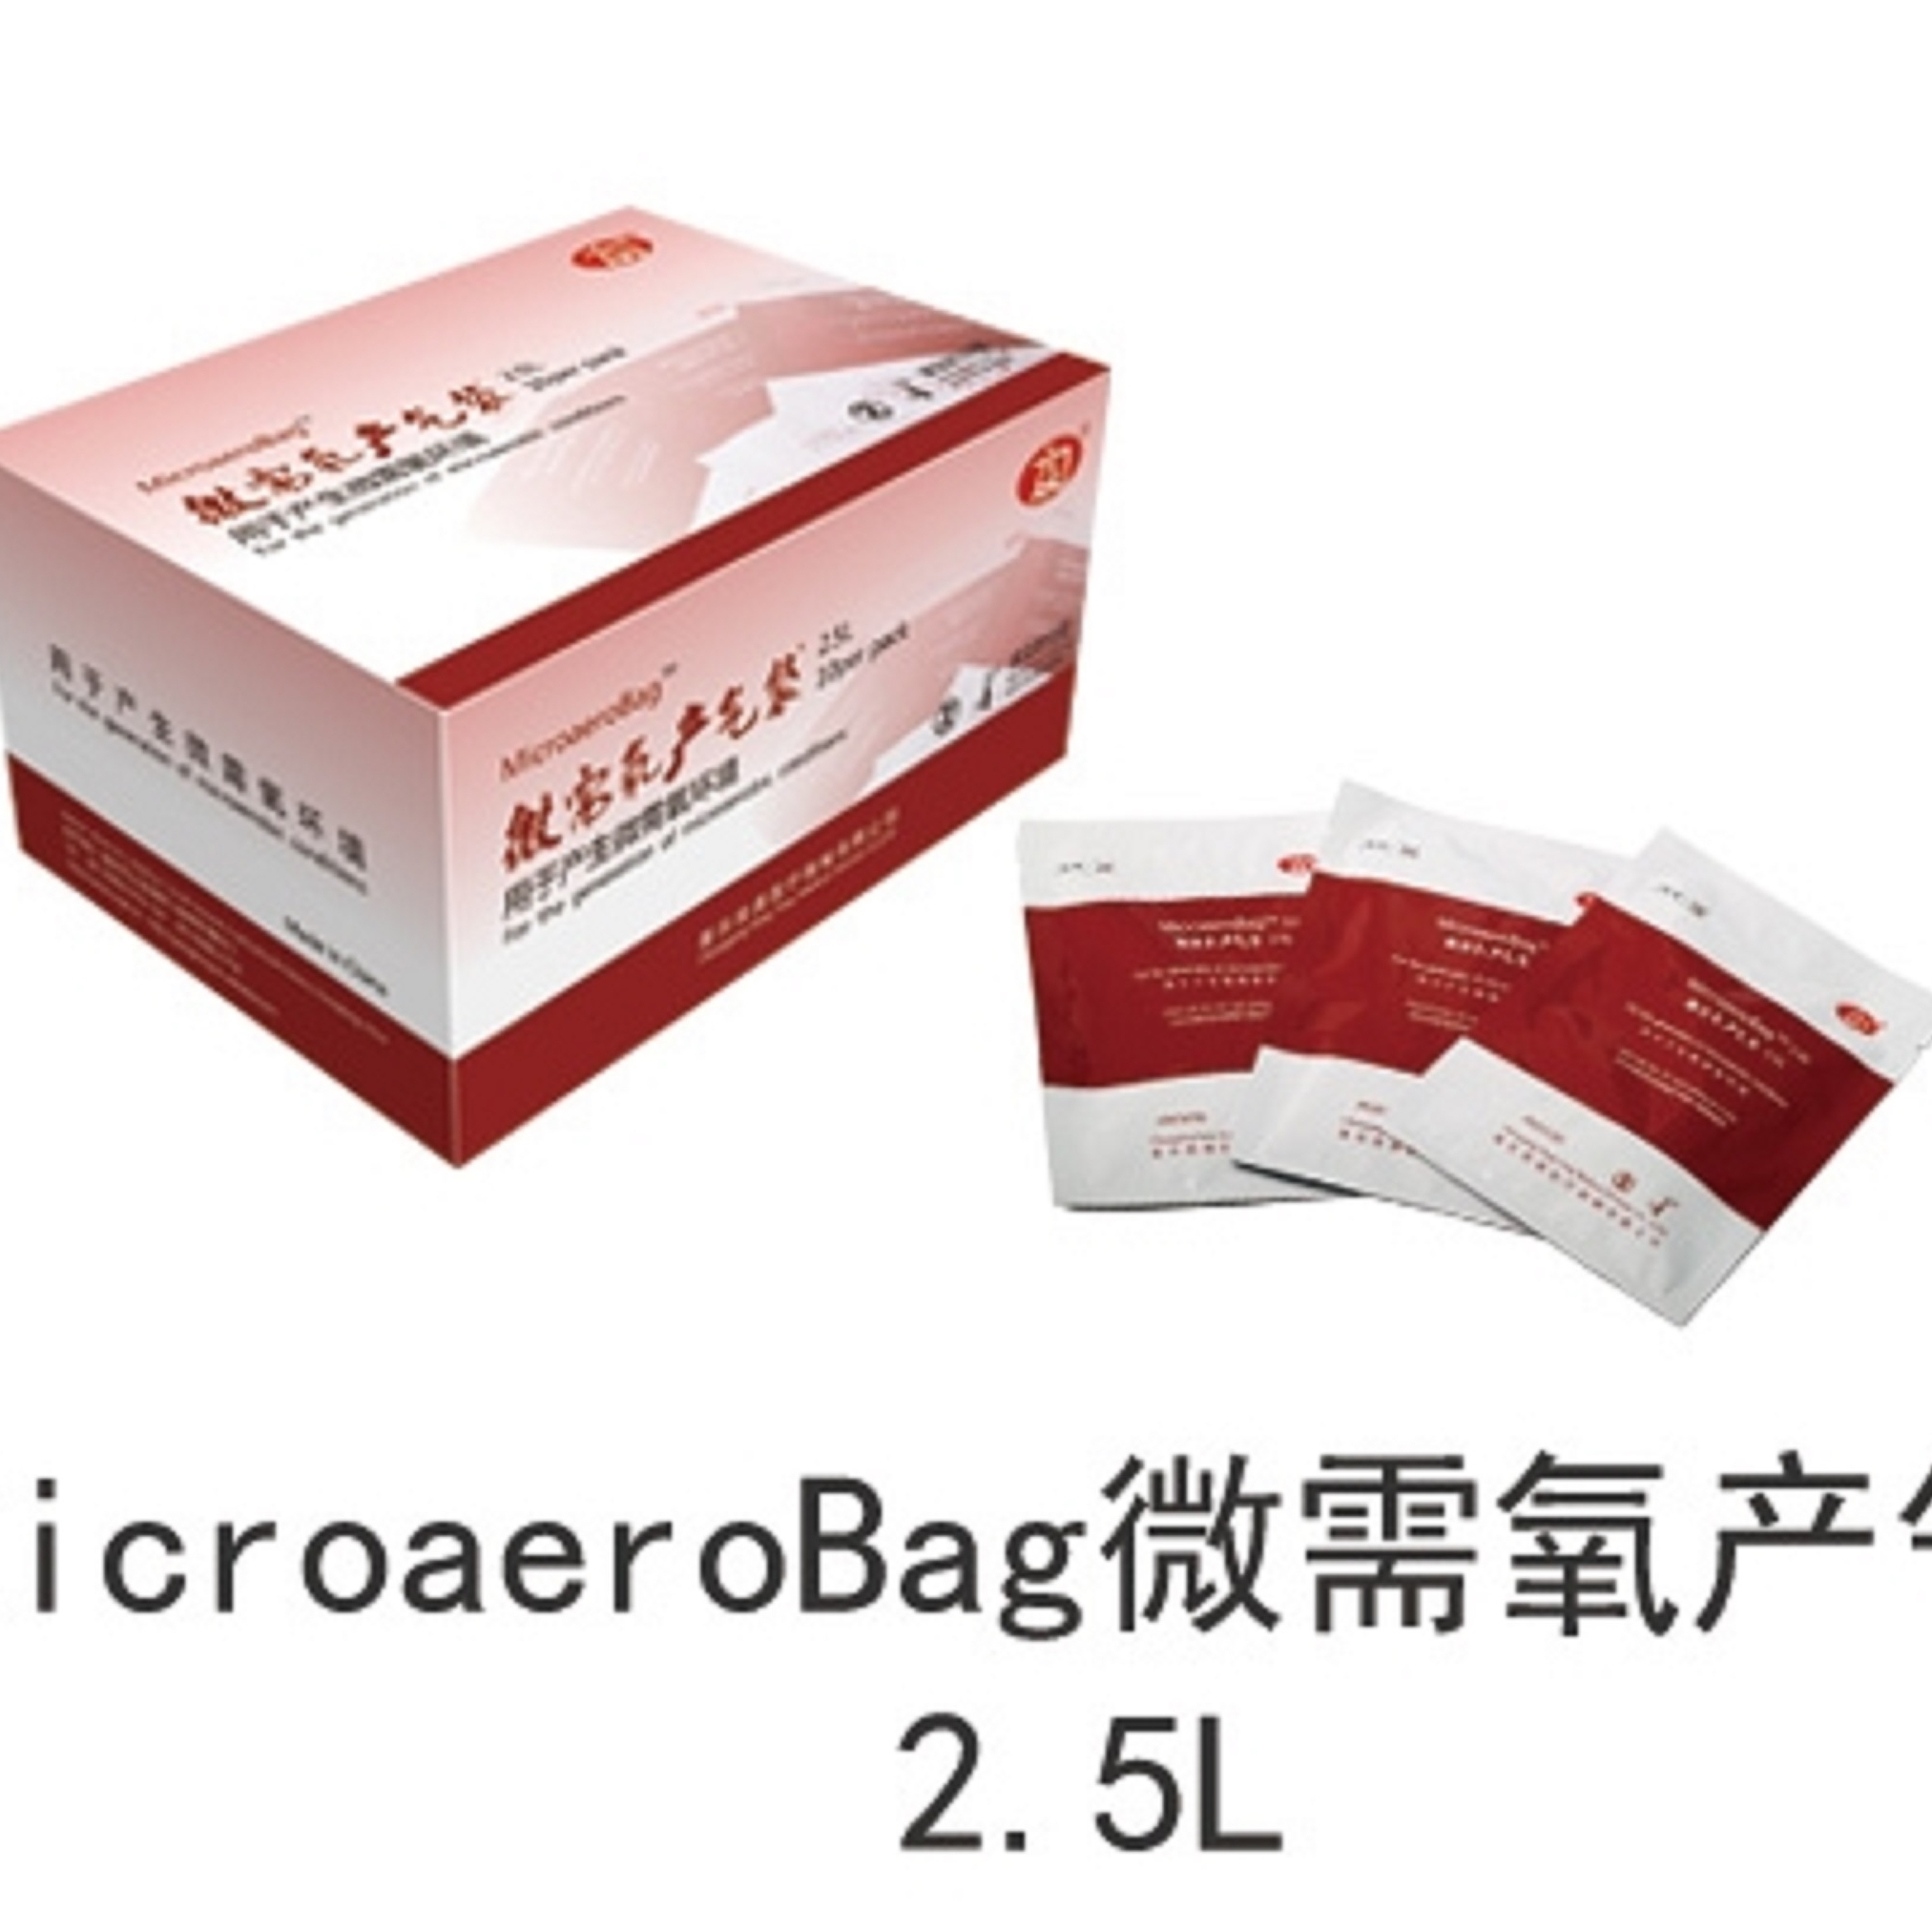 MicroaeroBagTM微需氧产气袋